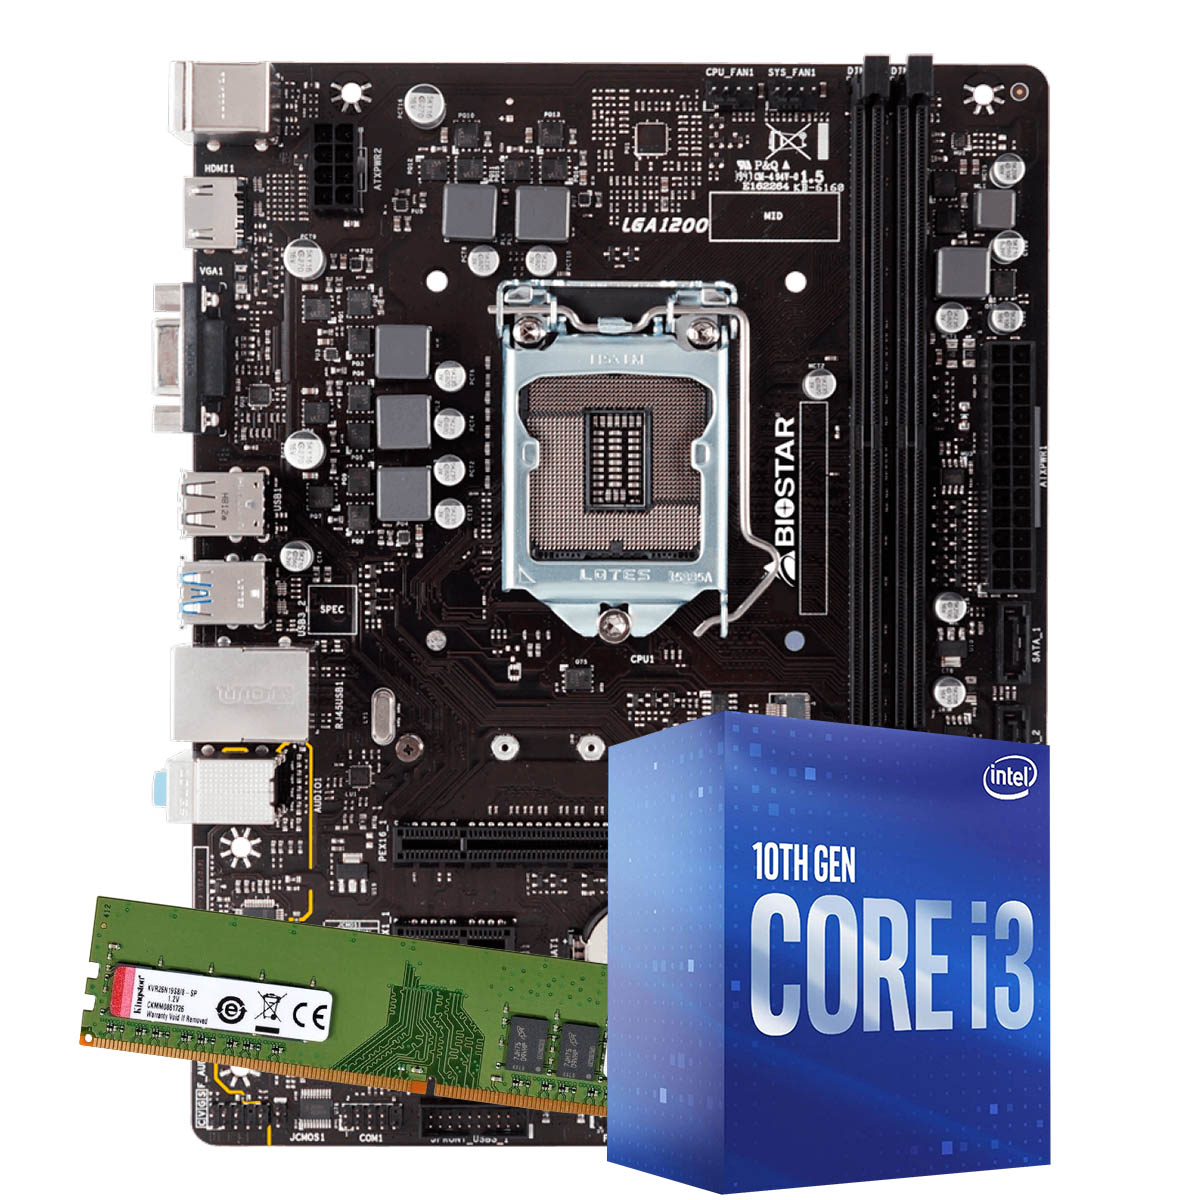 Kit Upgrade intel 10º geração Core i3-10100 3.6ghz ,Placa Mãe Gigabyte H410M H LGA 1200, 4GB DDR4